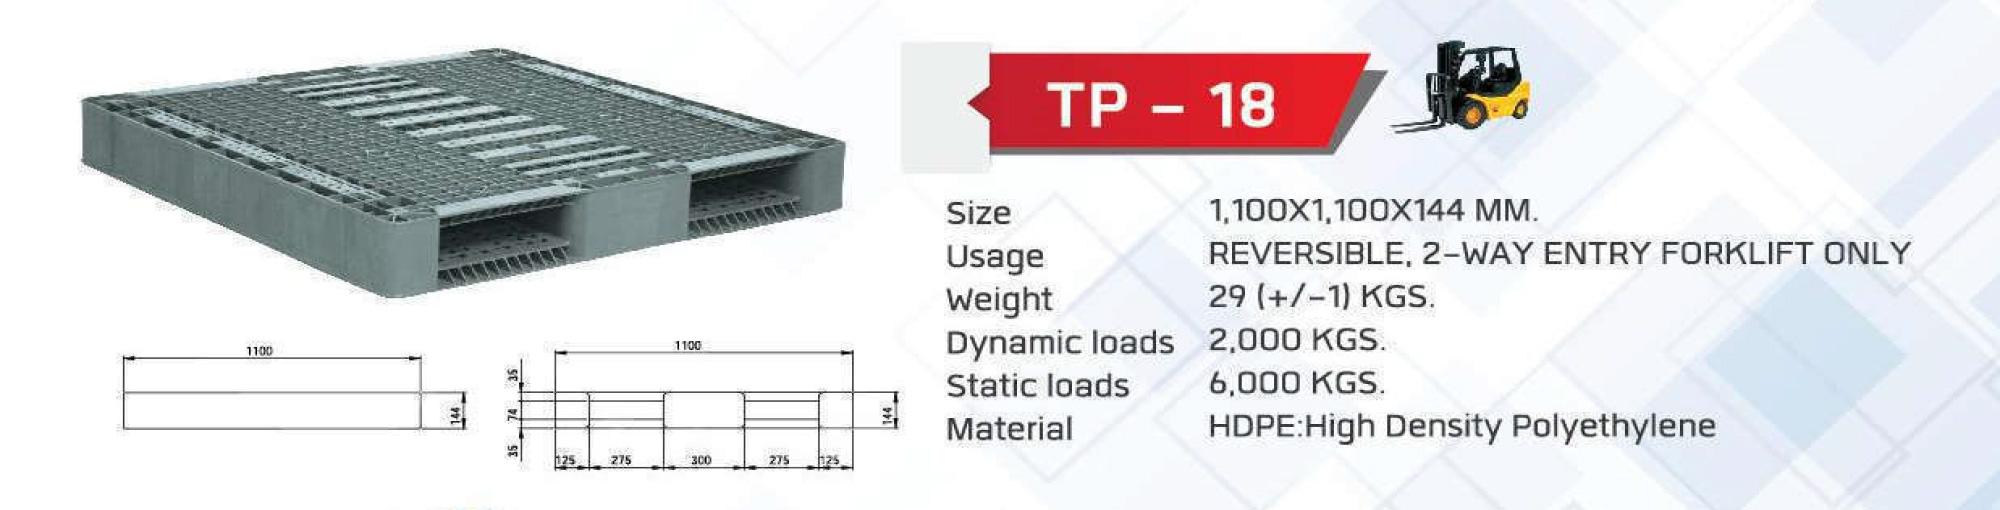 Reversible-HeavyDuty-TP-18